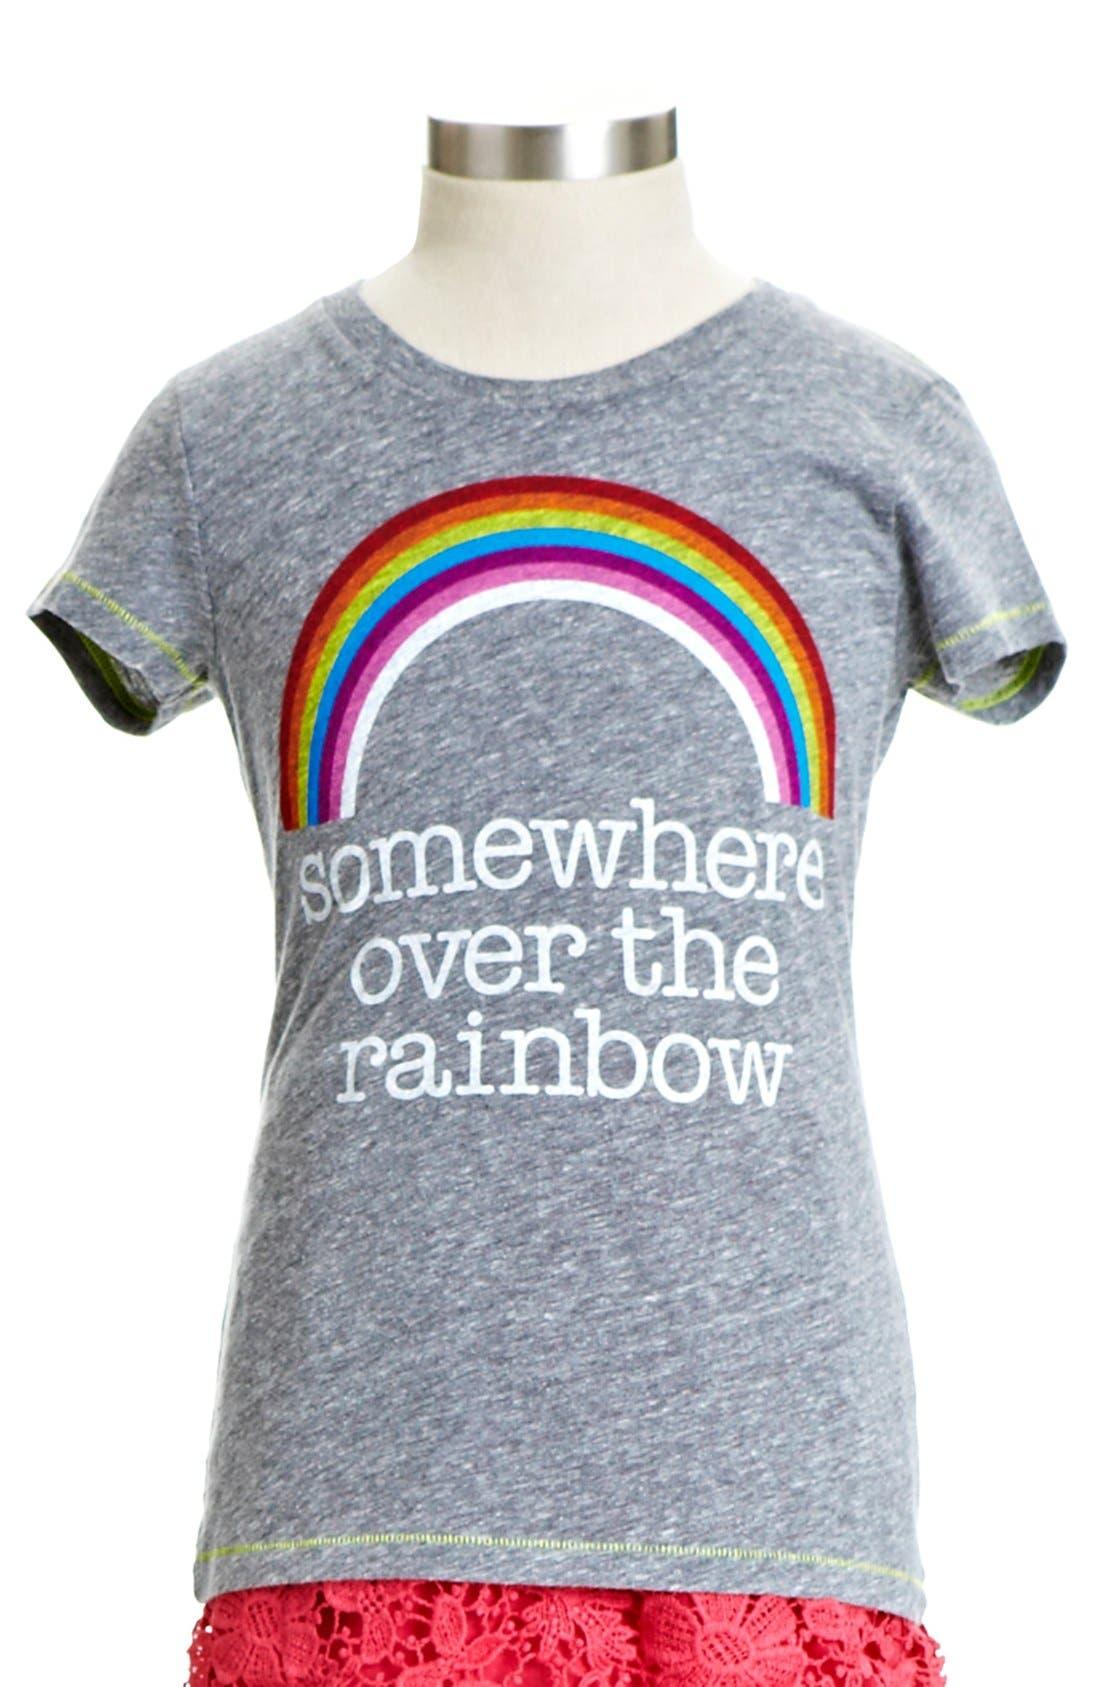 Alternate Image 1 Selected - Peek 'Over The Rainbow' Tee (Toddler Girls, Little Girls & Big Girls)